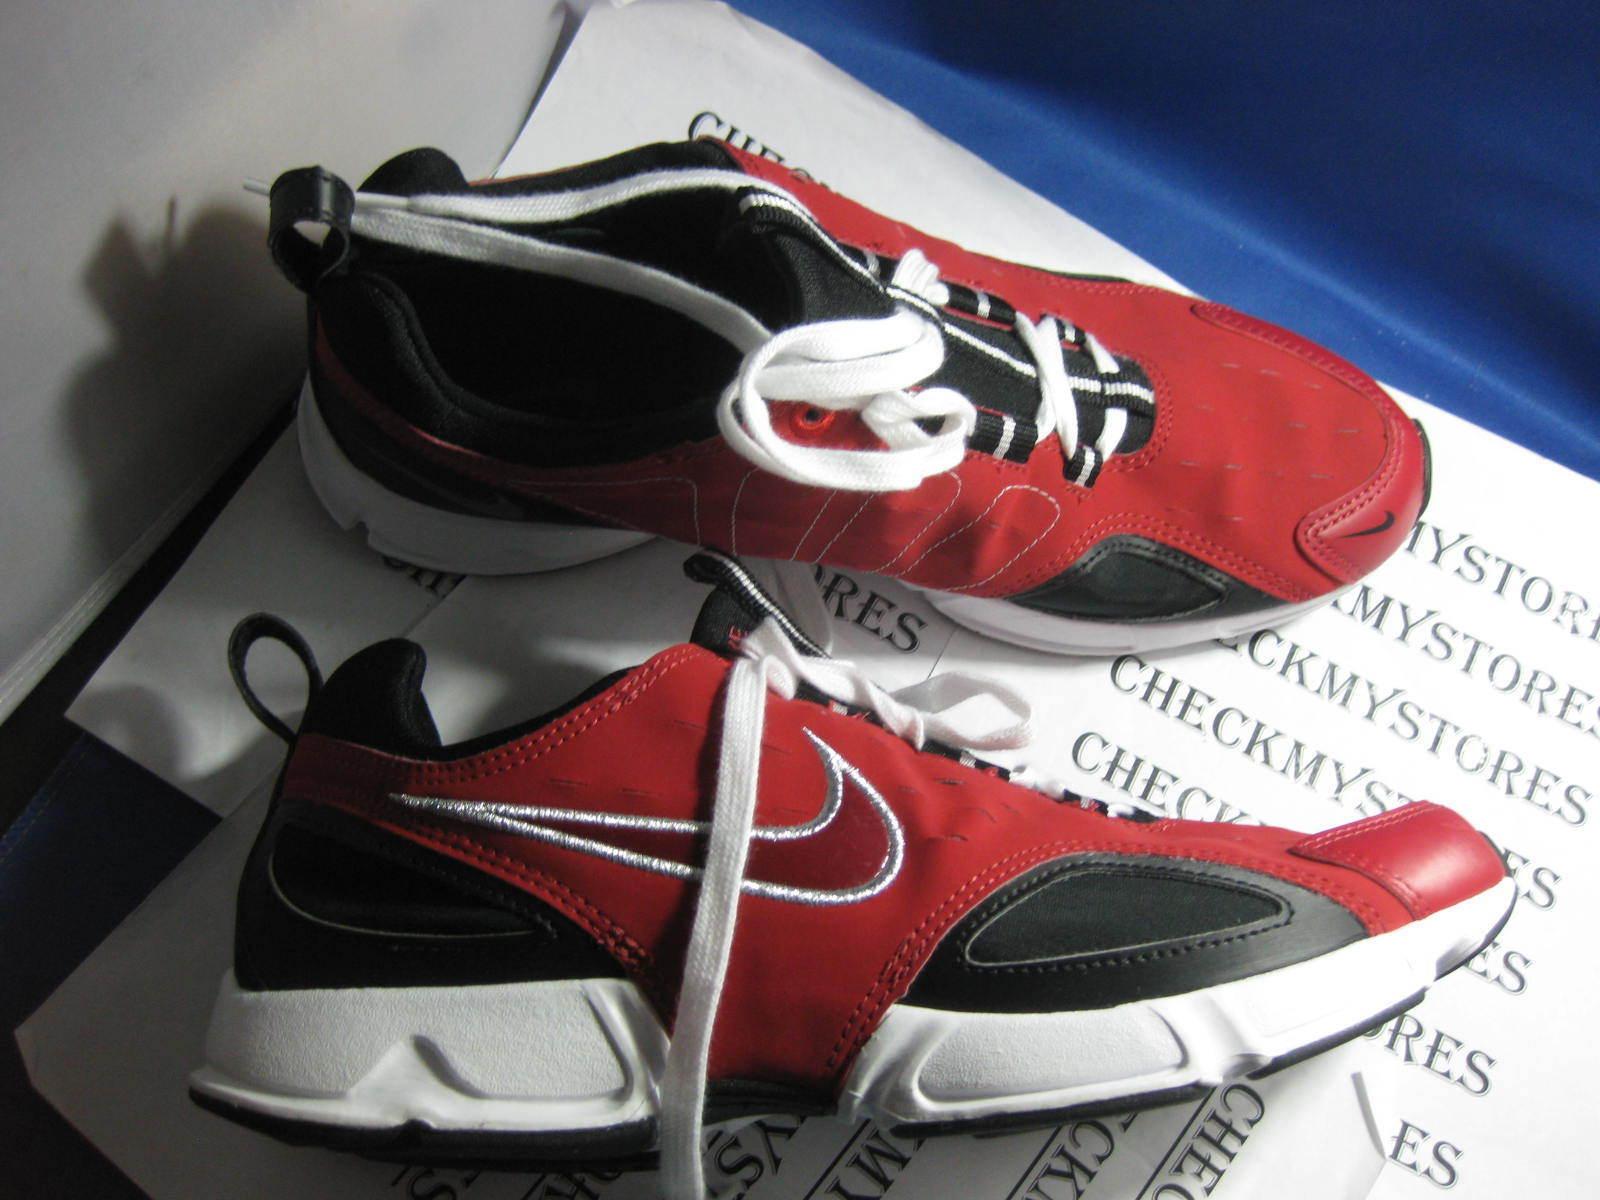 NIB New Nike RECOUPE RUNNING/COURSE SUPER LIGHT SHOES SZ 11